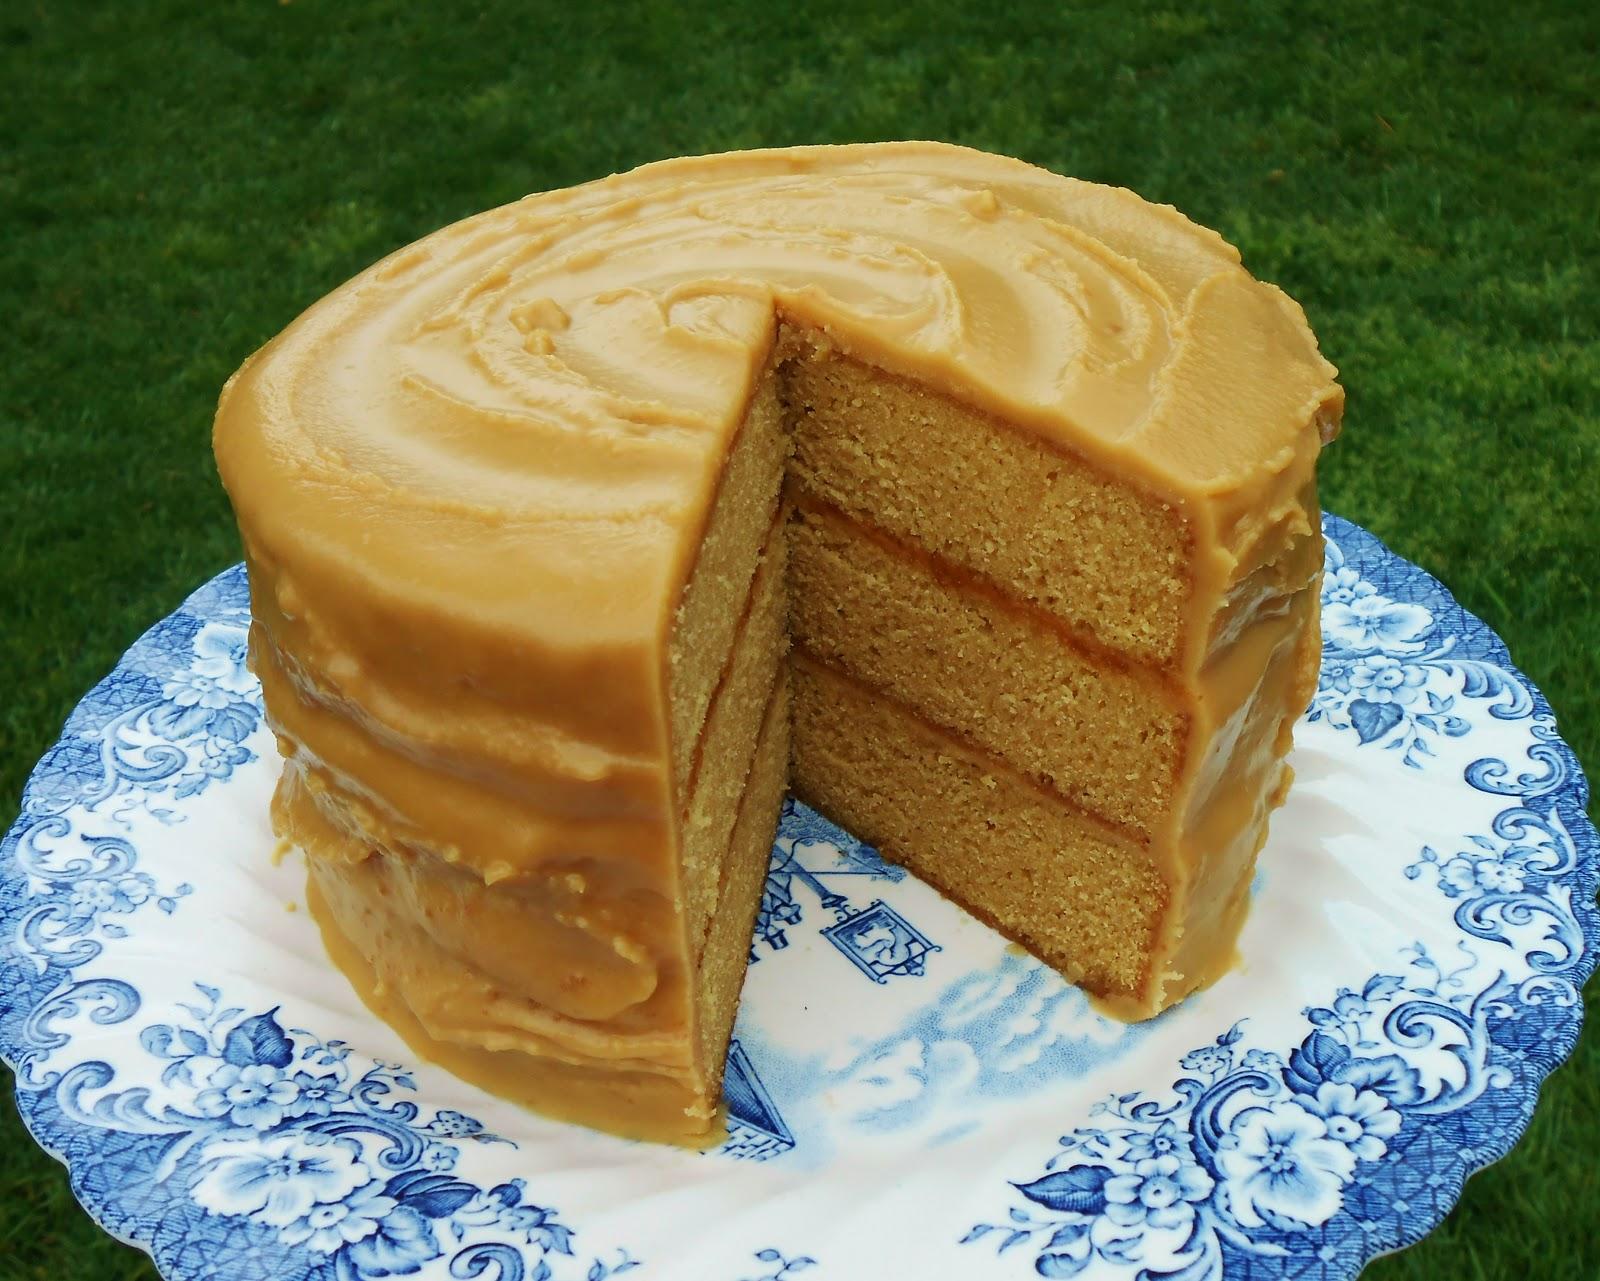 How To Make A Caramel Cake Video